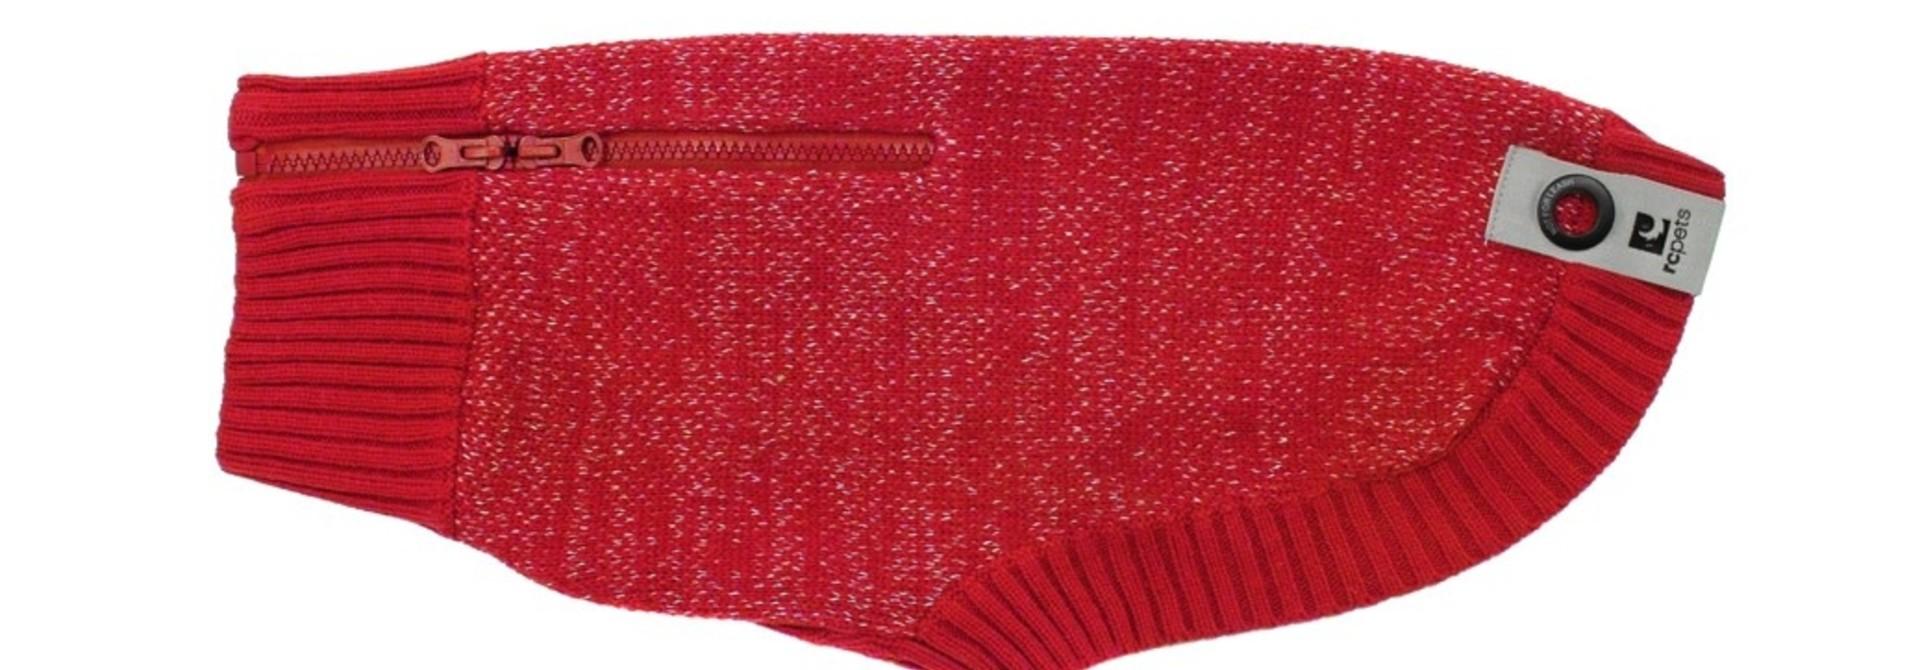 Polaris Sweater L Red